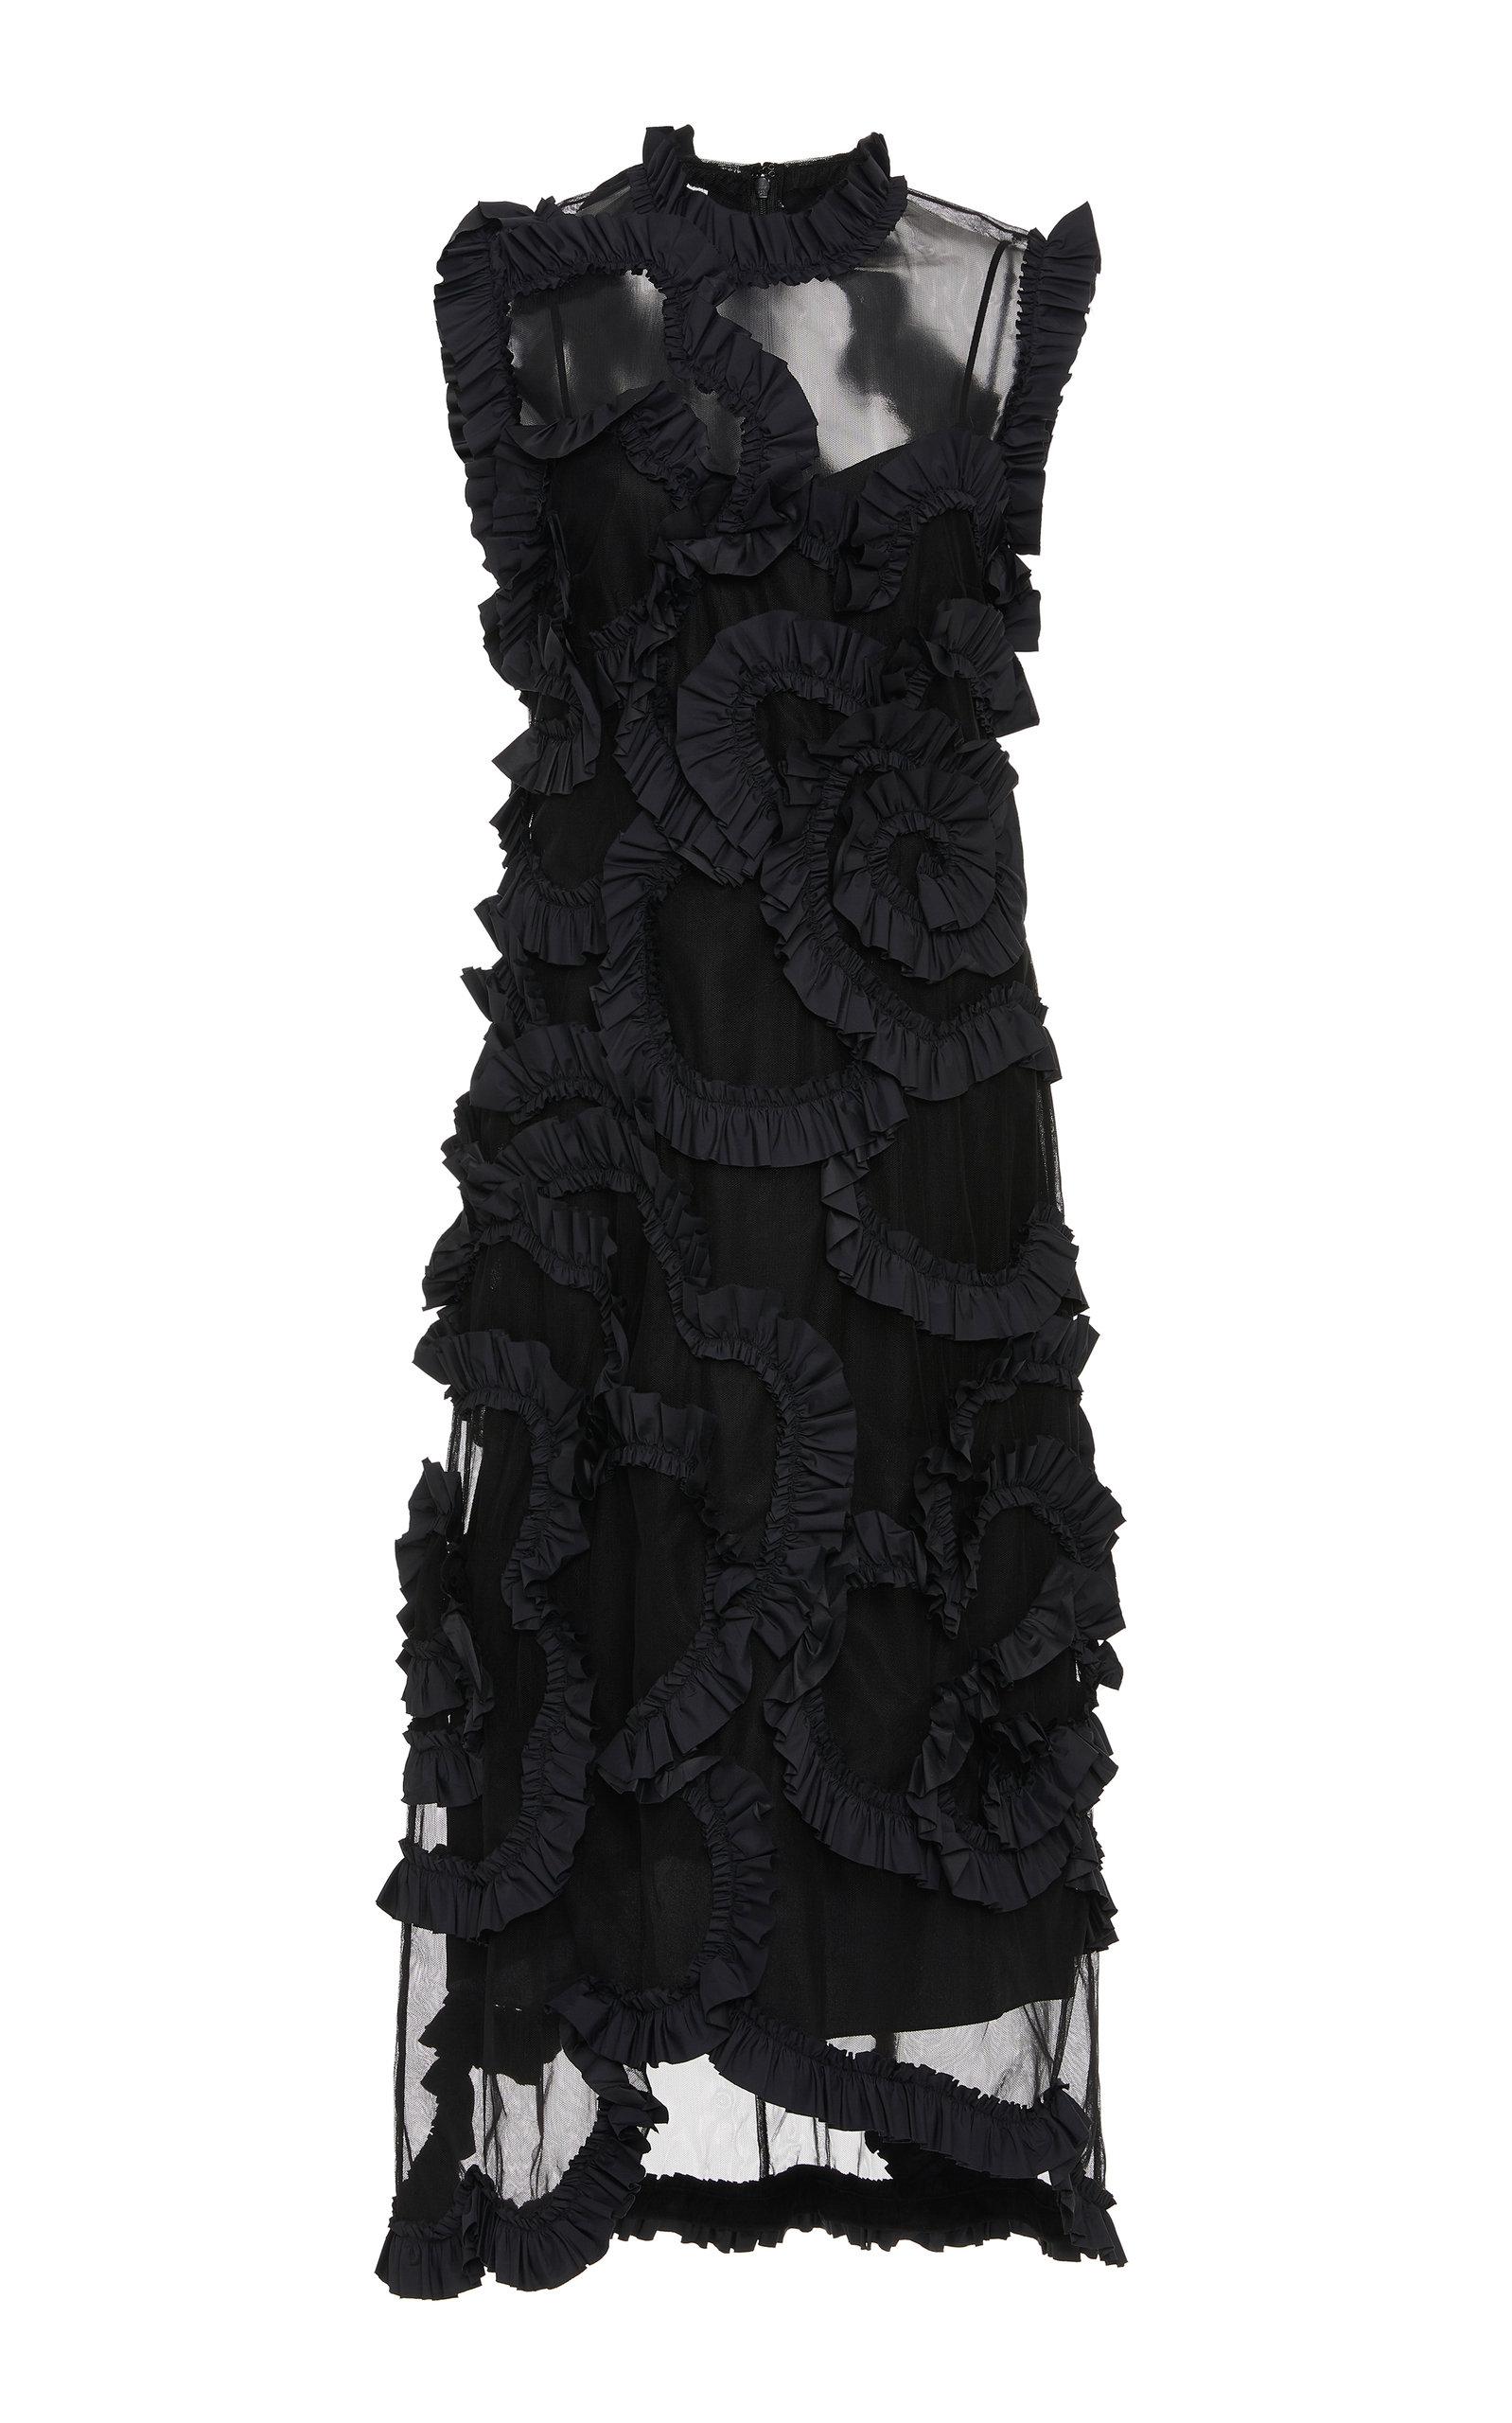 Moncler Genius Dresses + SIMONE ROCHA RUFFLED SILK-CHIFFON MIDI DRESS